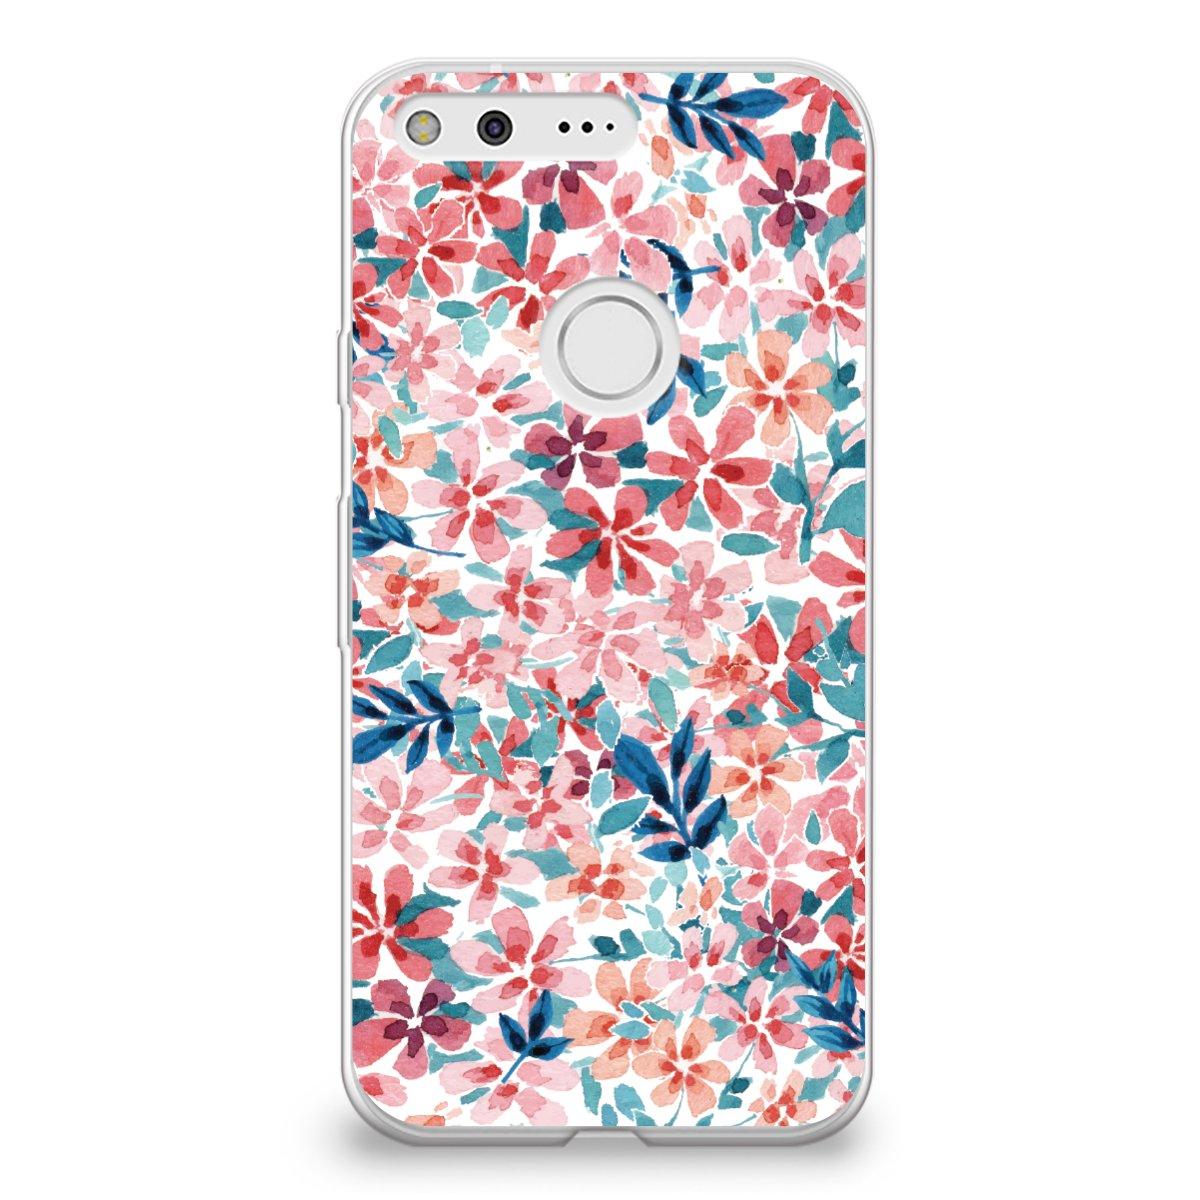 CasesByLorraine Google Pixel XL Case, Colorful Watercolor Print Floral Flowers Case Flexible TPU Soft Gel Protective Cover for Google Pixel XL (P69)